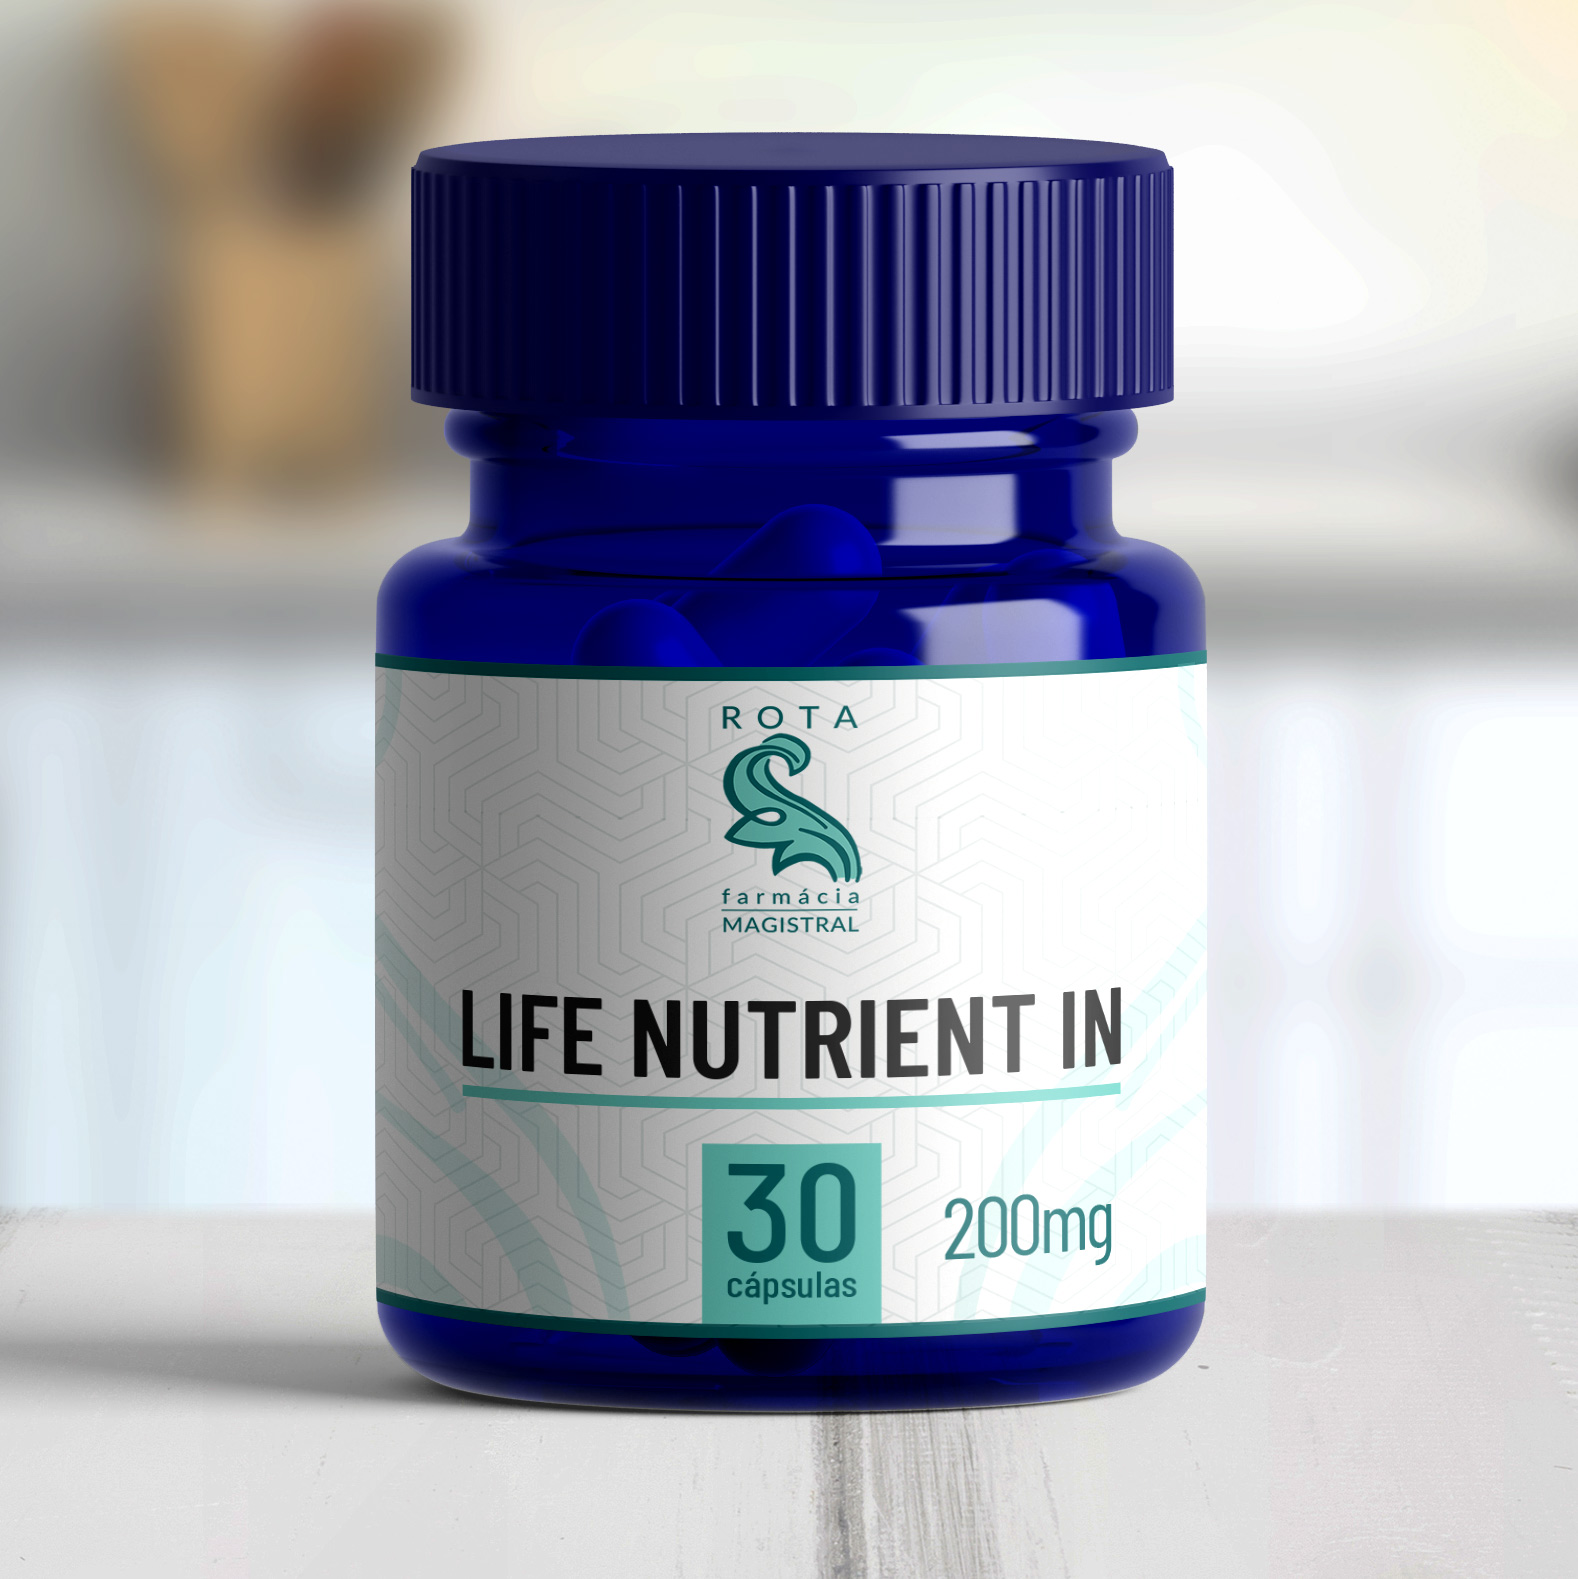 Life Nutrient In 200mg 30 cápsulas